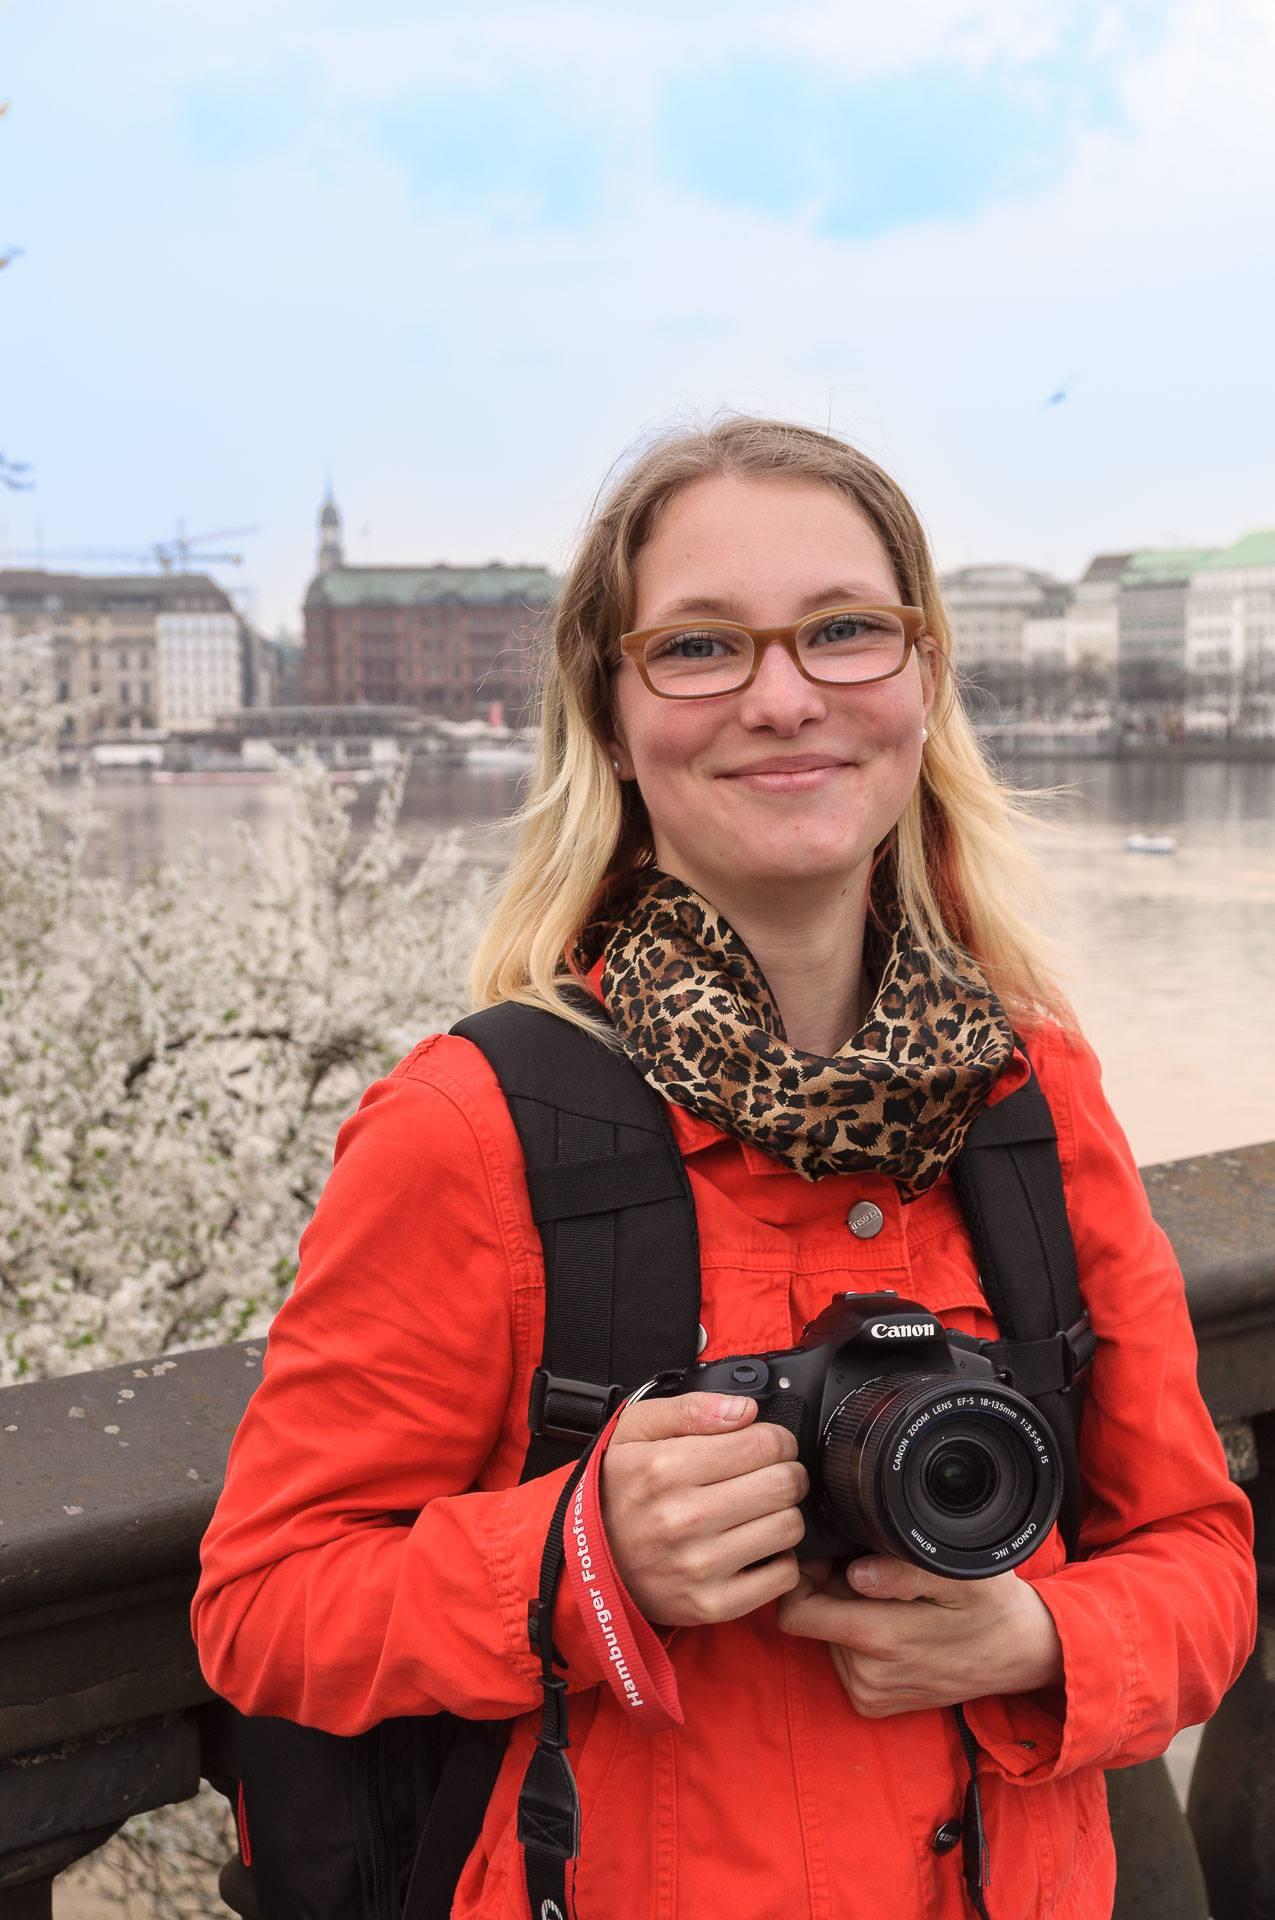 Galerie30 Fotografin Sarah Amori